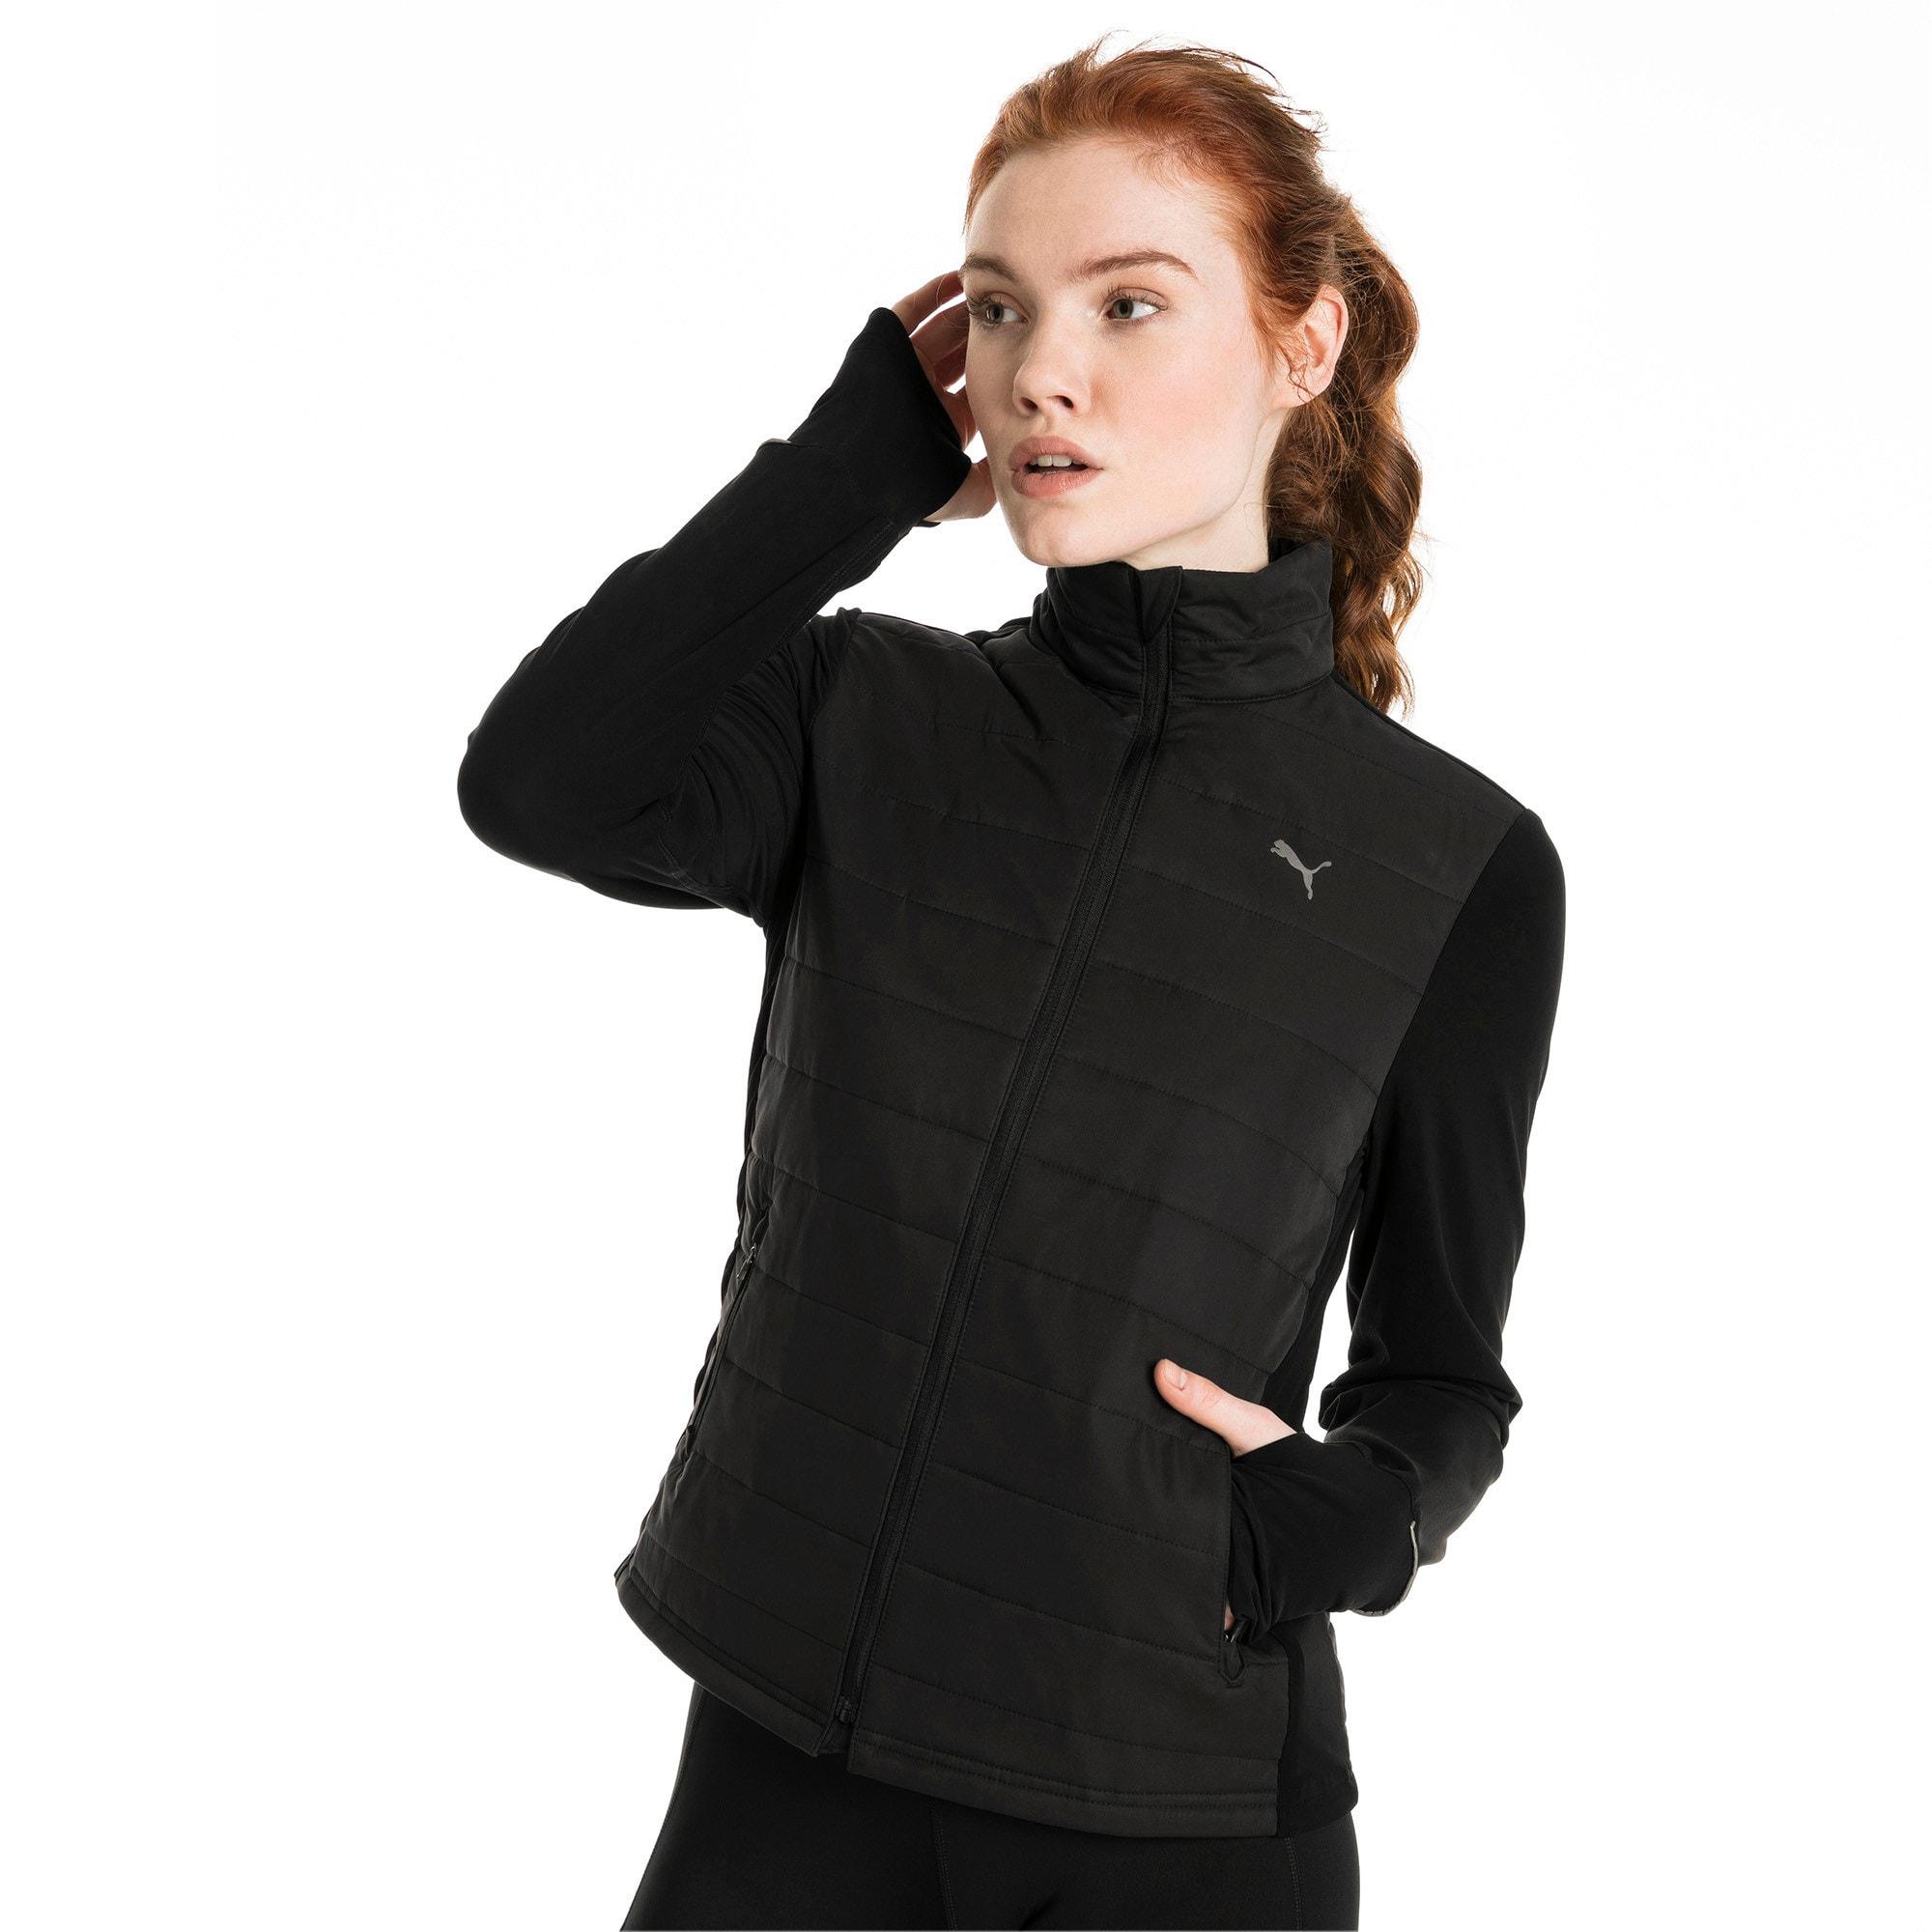 Thumbnail 2 of Winter Zip-Up Women's Jacket, Puma Black, medium